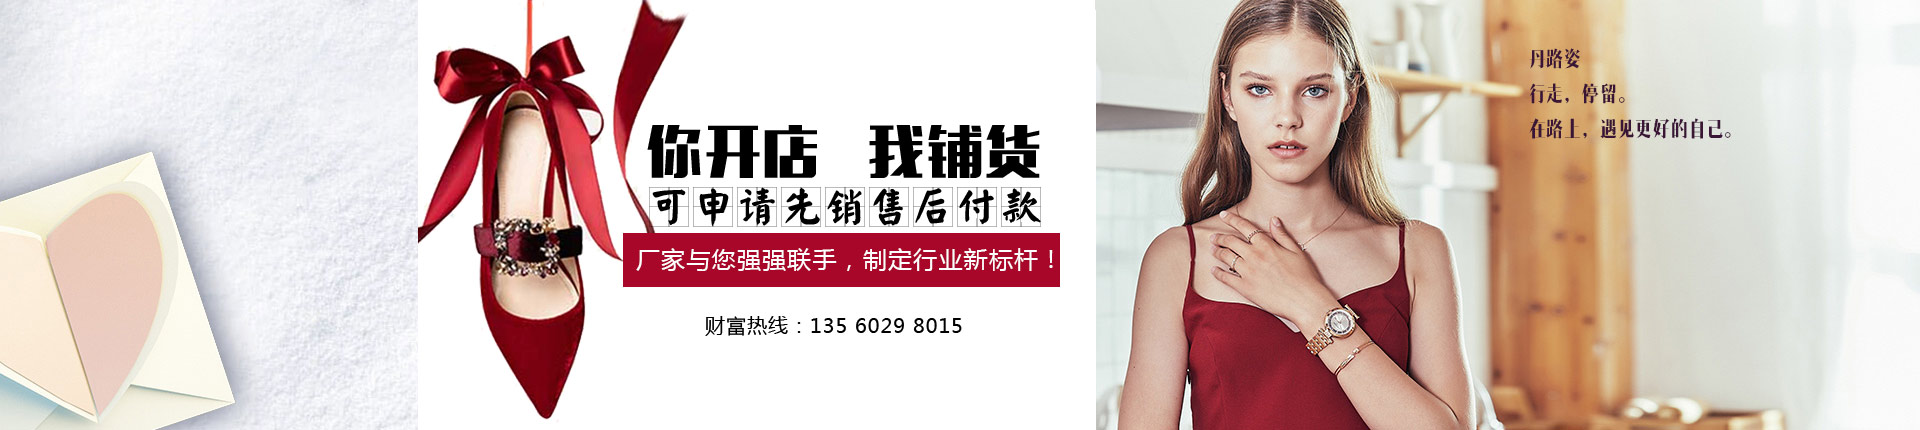 丹路姿官方網站